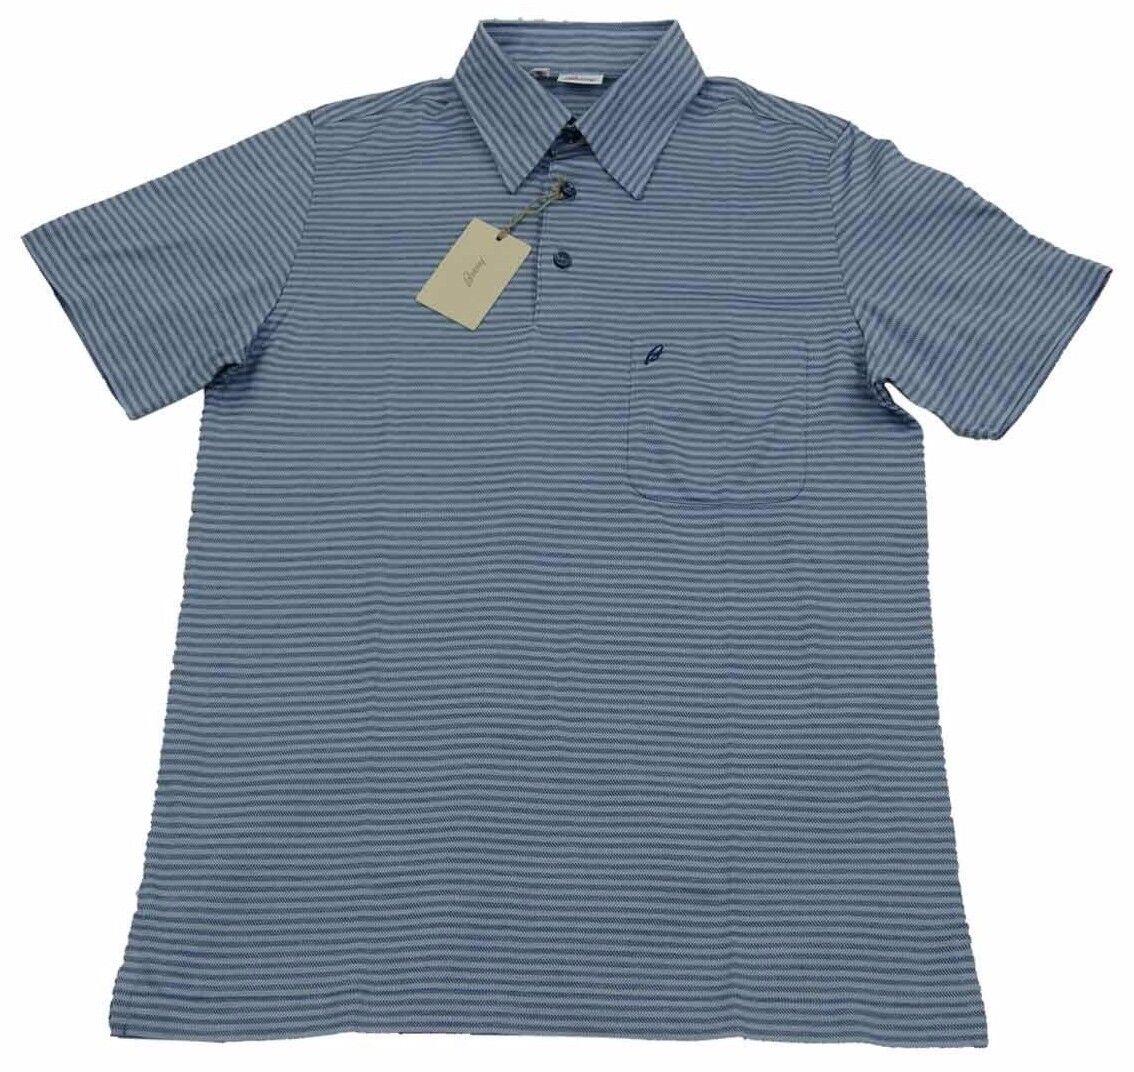 Brioni  Herren Polo T Shirt Handmade SZ S / EU 46 UK 36 Made in italy Cotton